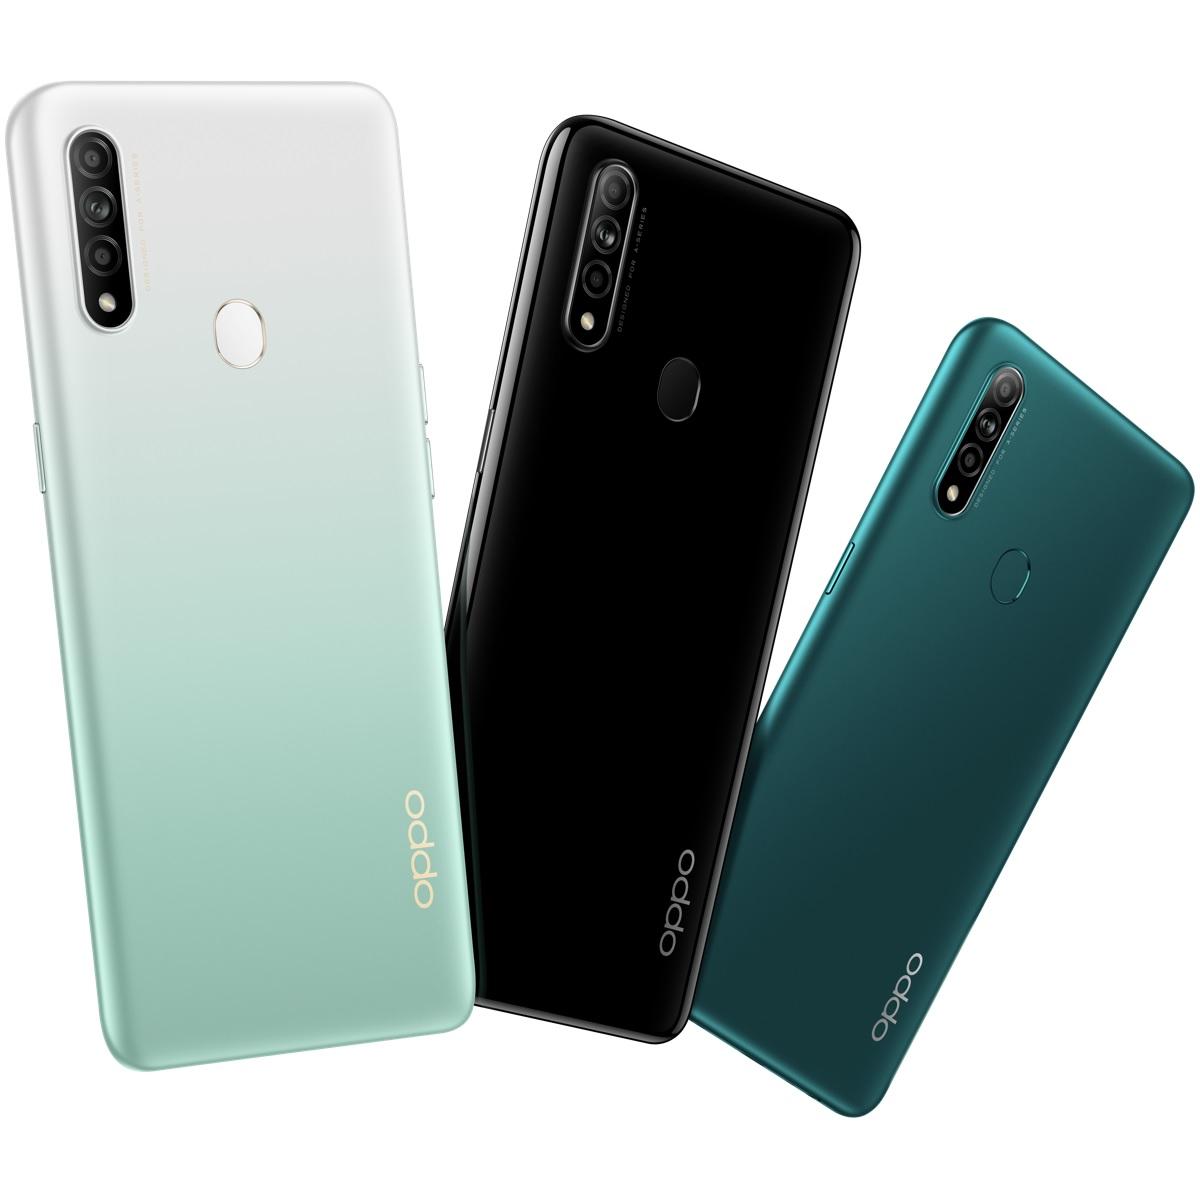 Oppo A31 smartphone